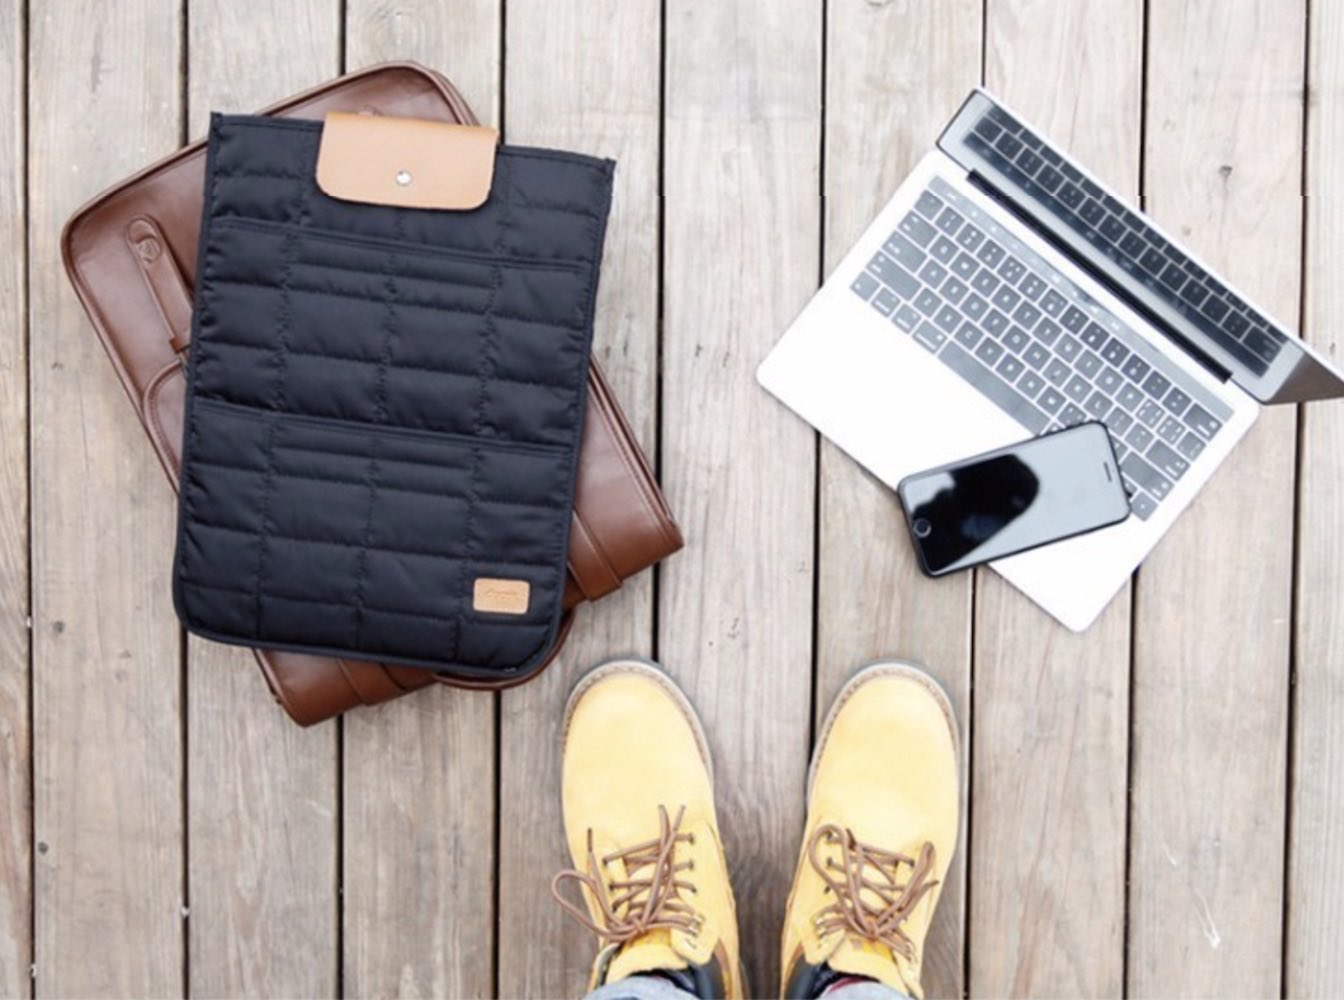 Compact MacBook Handbag